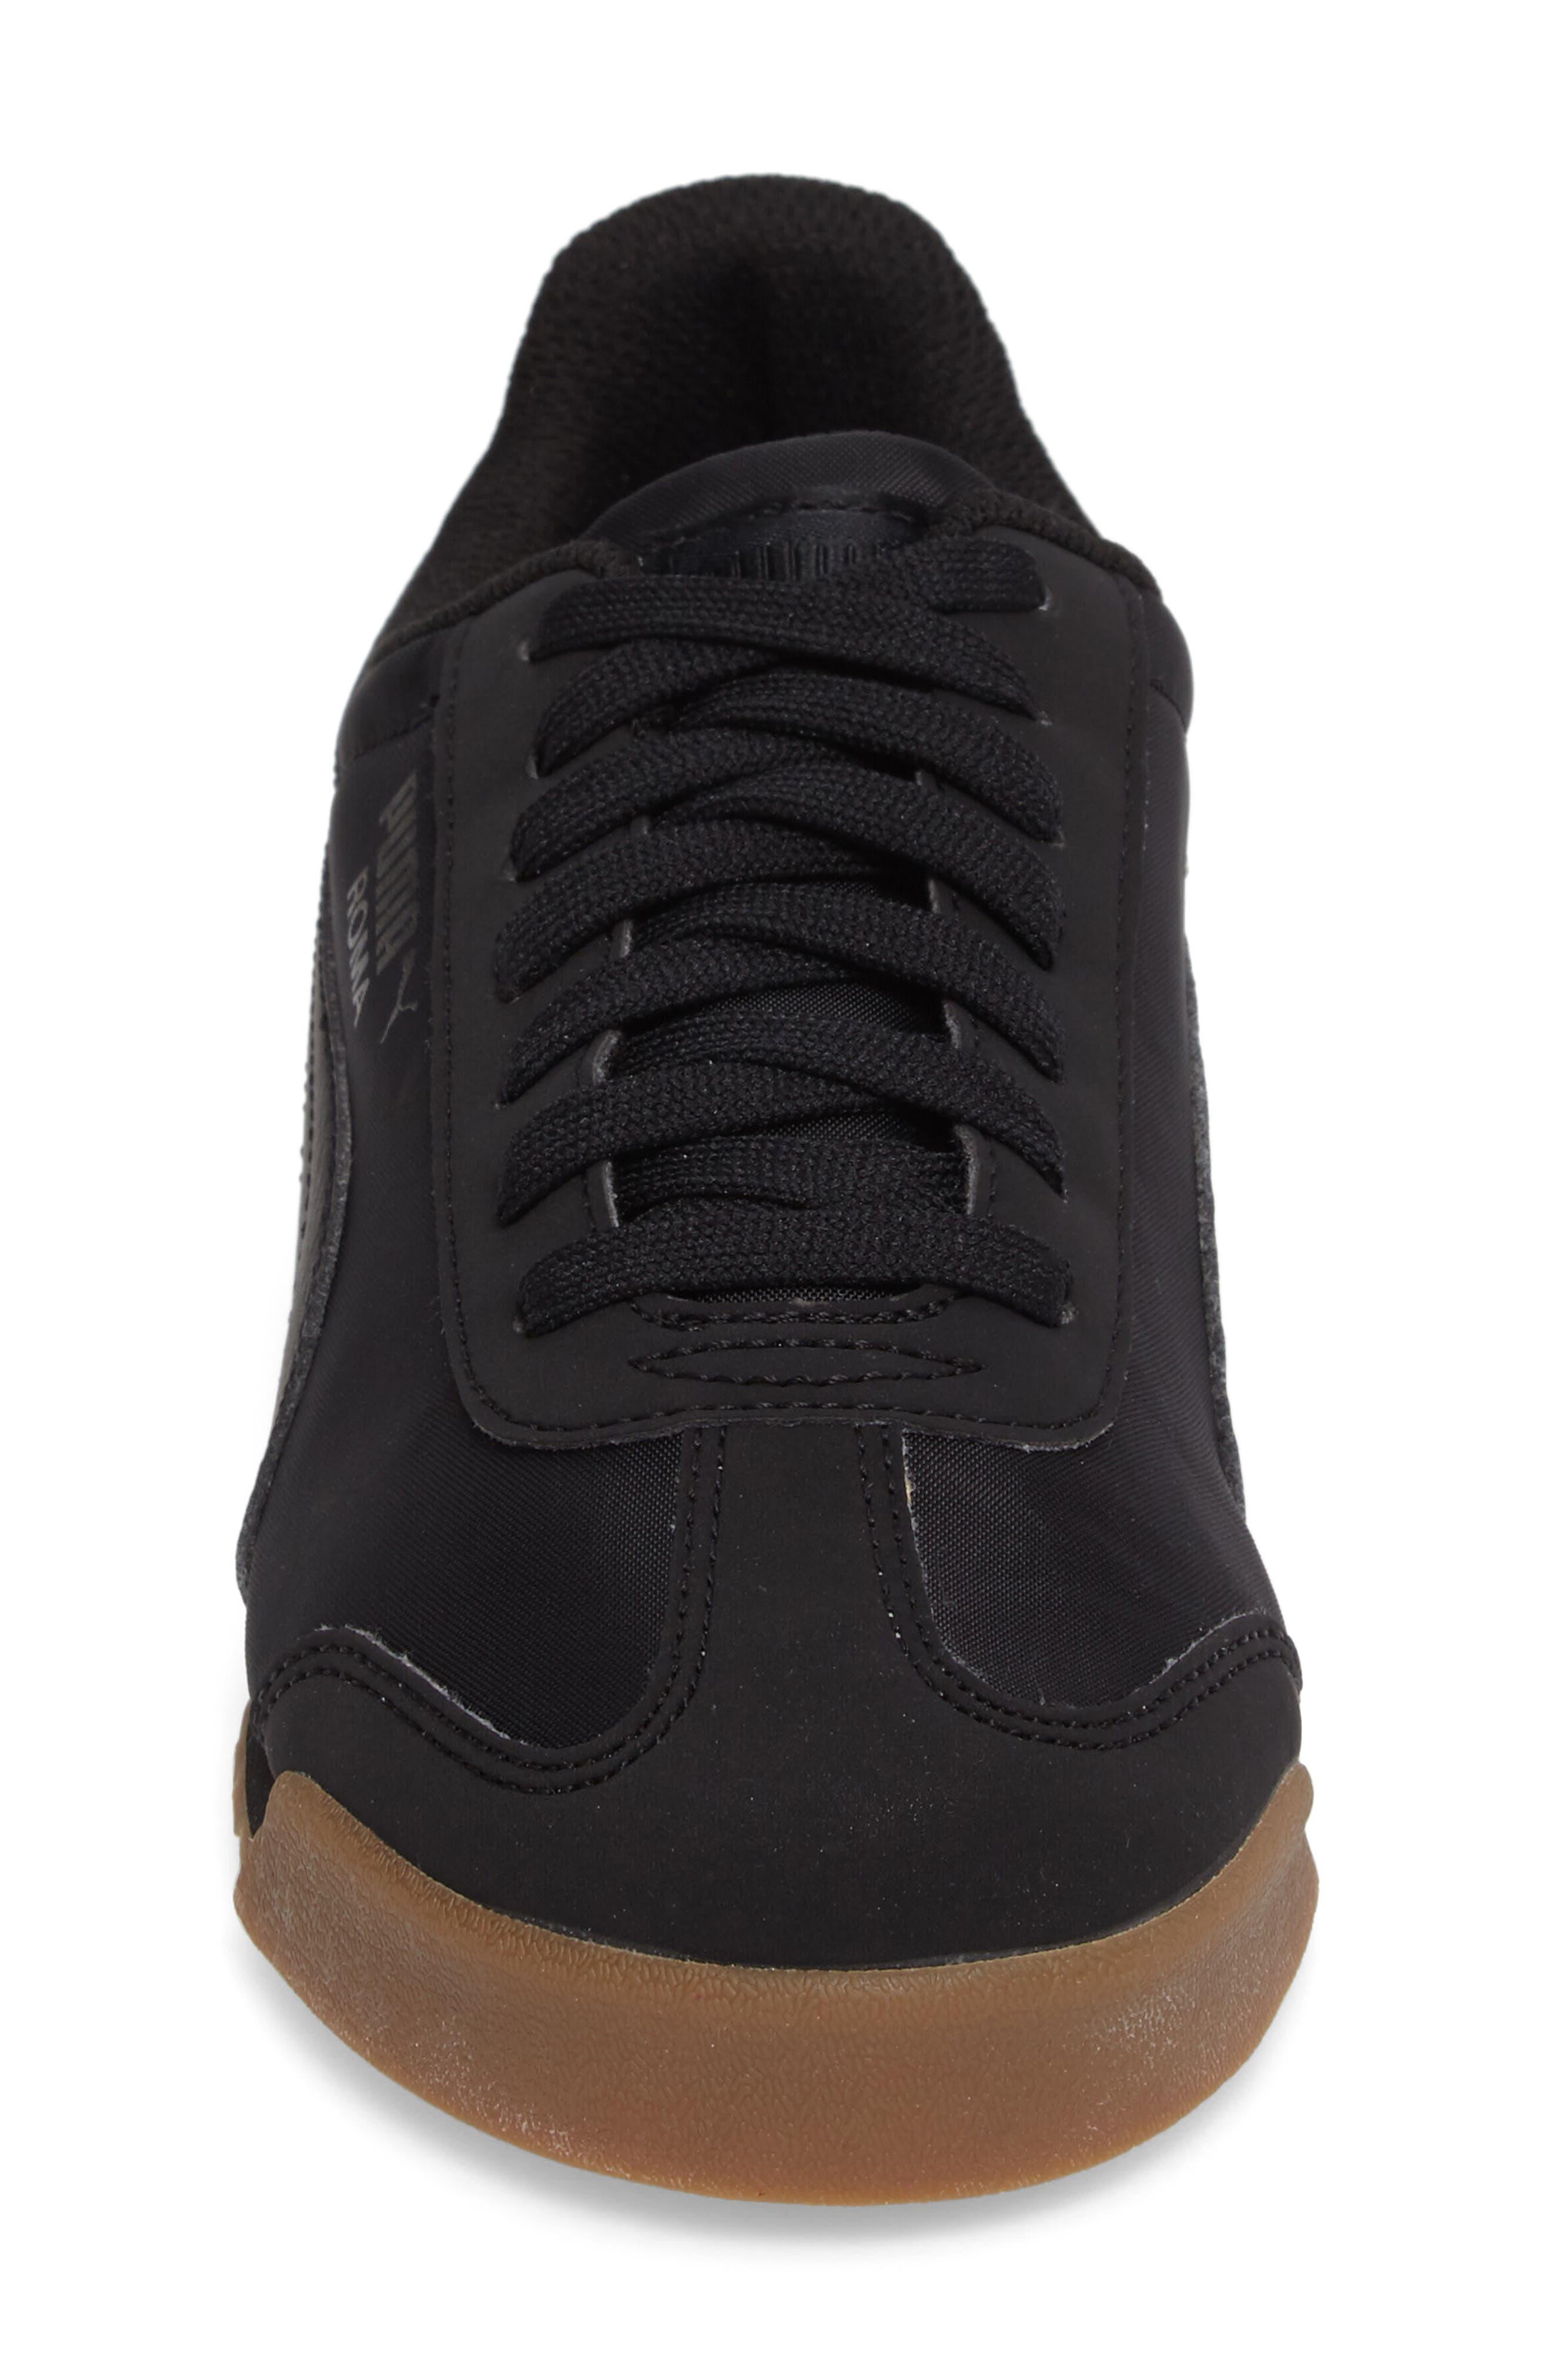 PUMA,                             Roma Basic Summer Sneaker,                             Alternate thumbnail 4, color,                             001